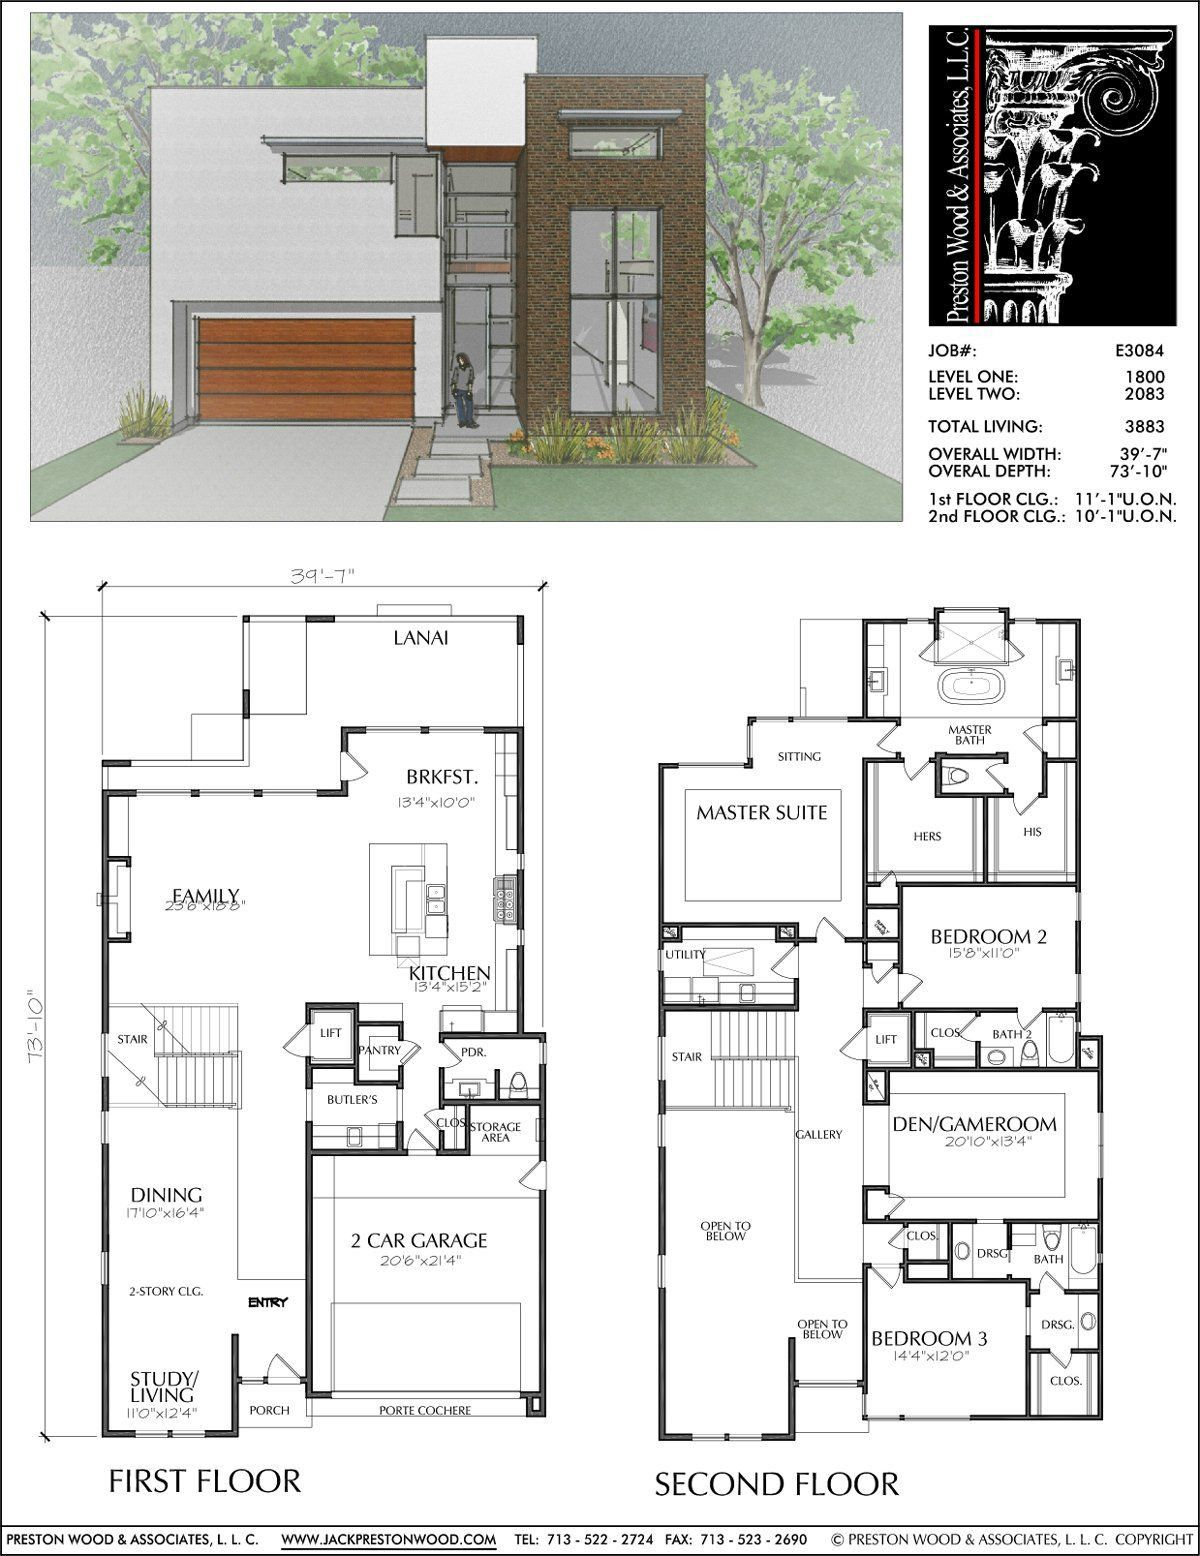 Small 2 Story House Design 2021 Arsitektur Modern Arsitektur Arsitektur Rumah